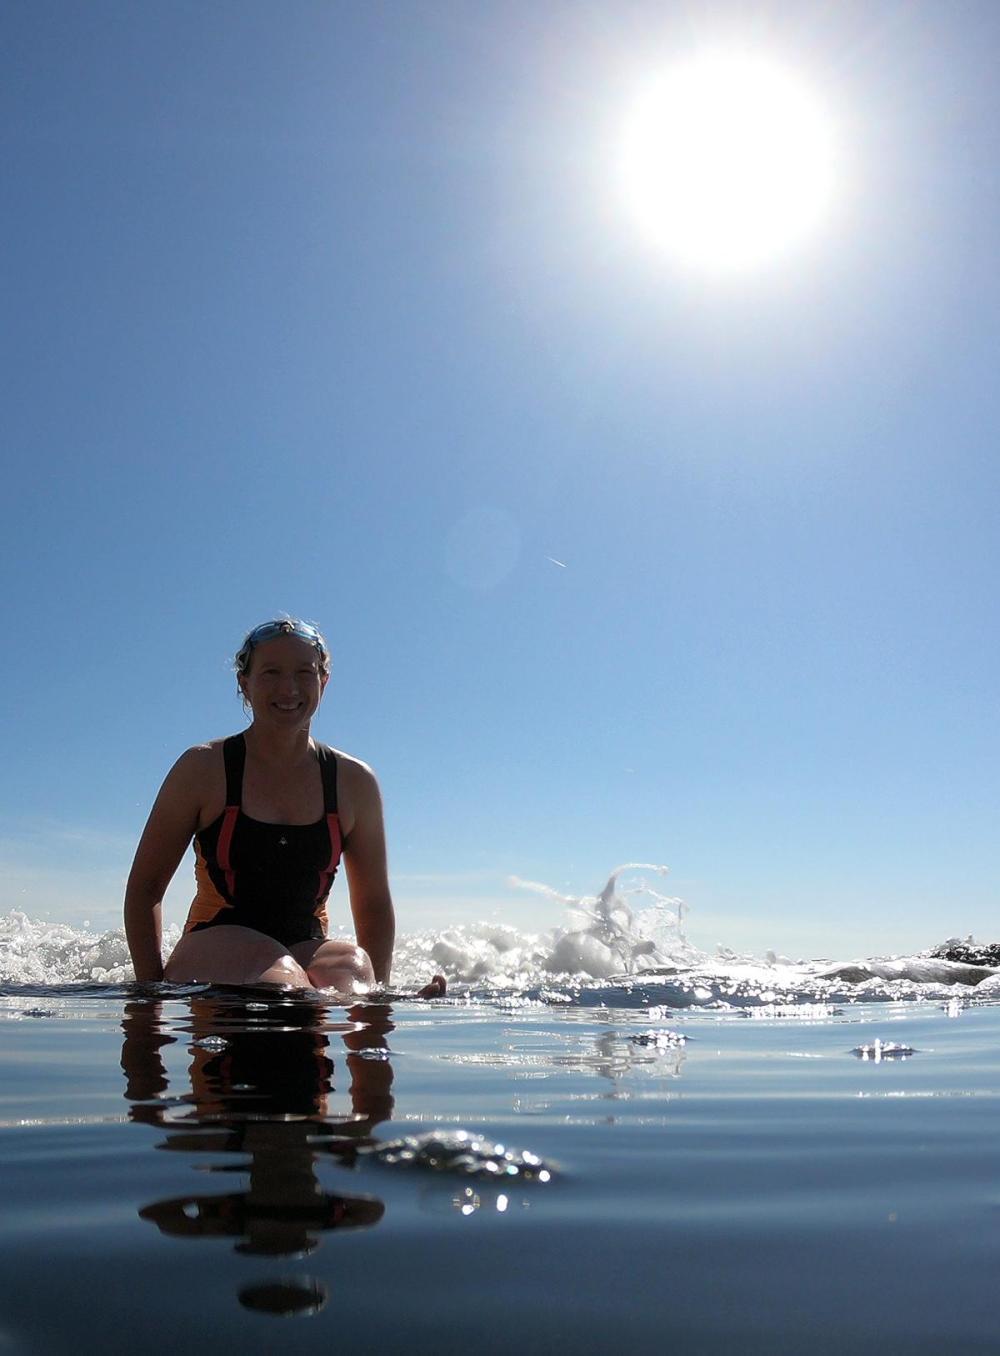 Splodz Blogz | Swimming at Dancing Ledge, Dorset